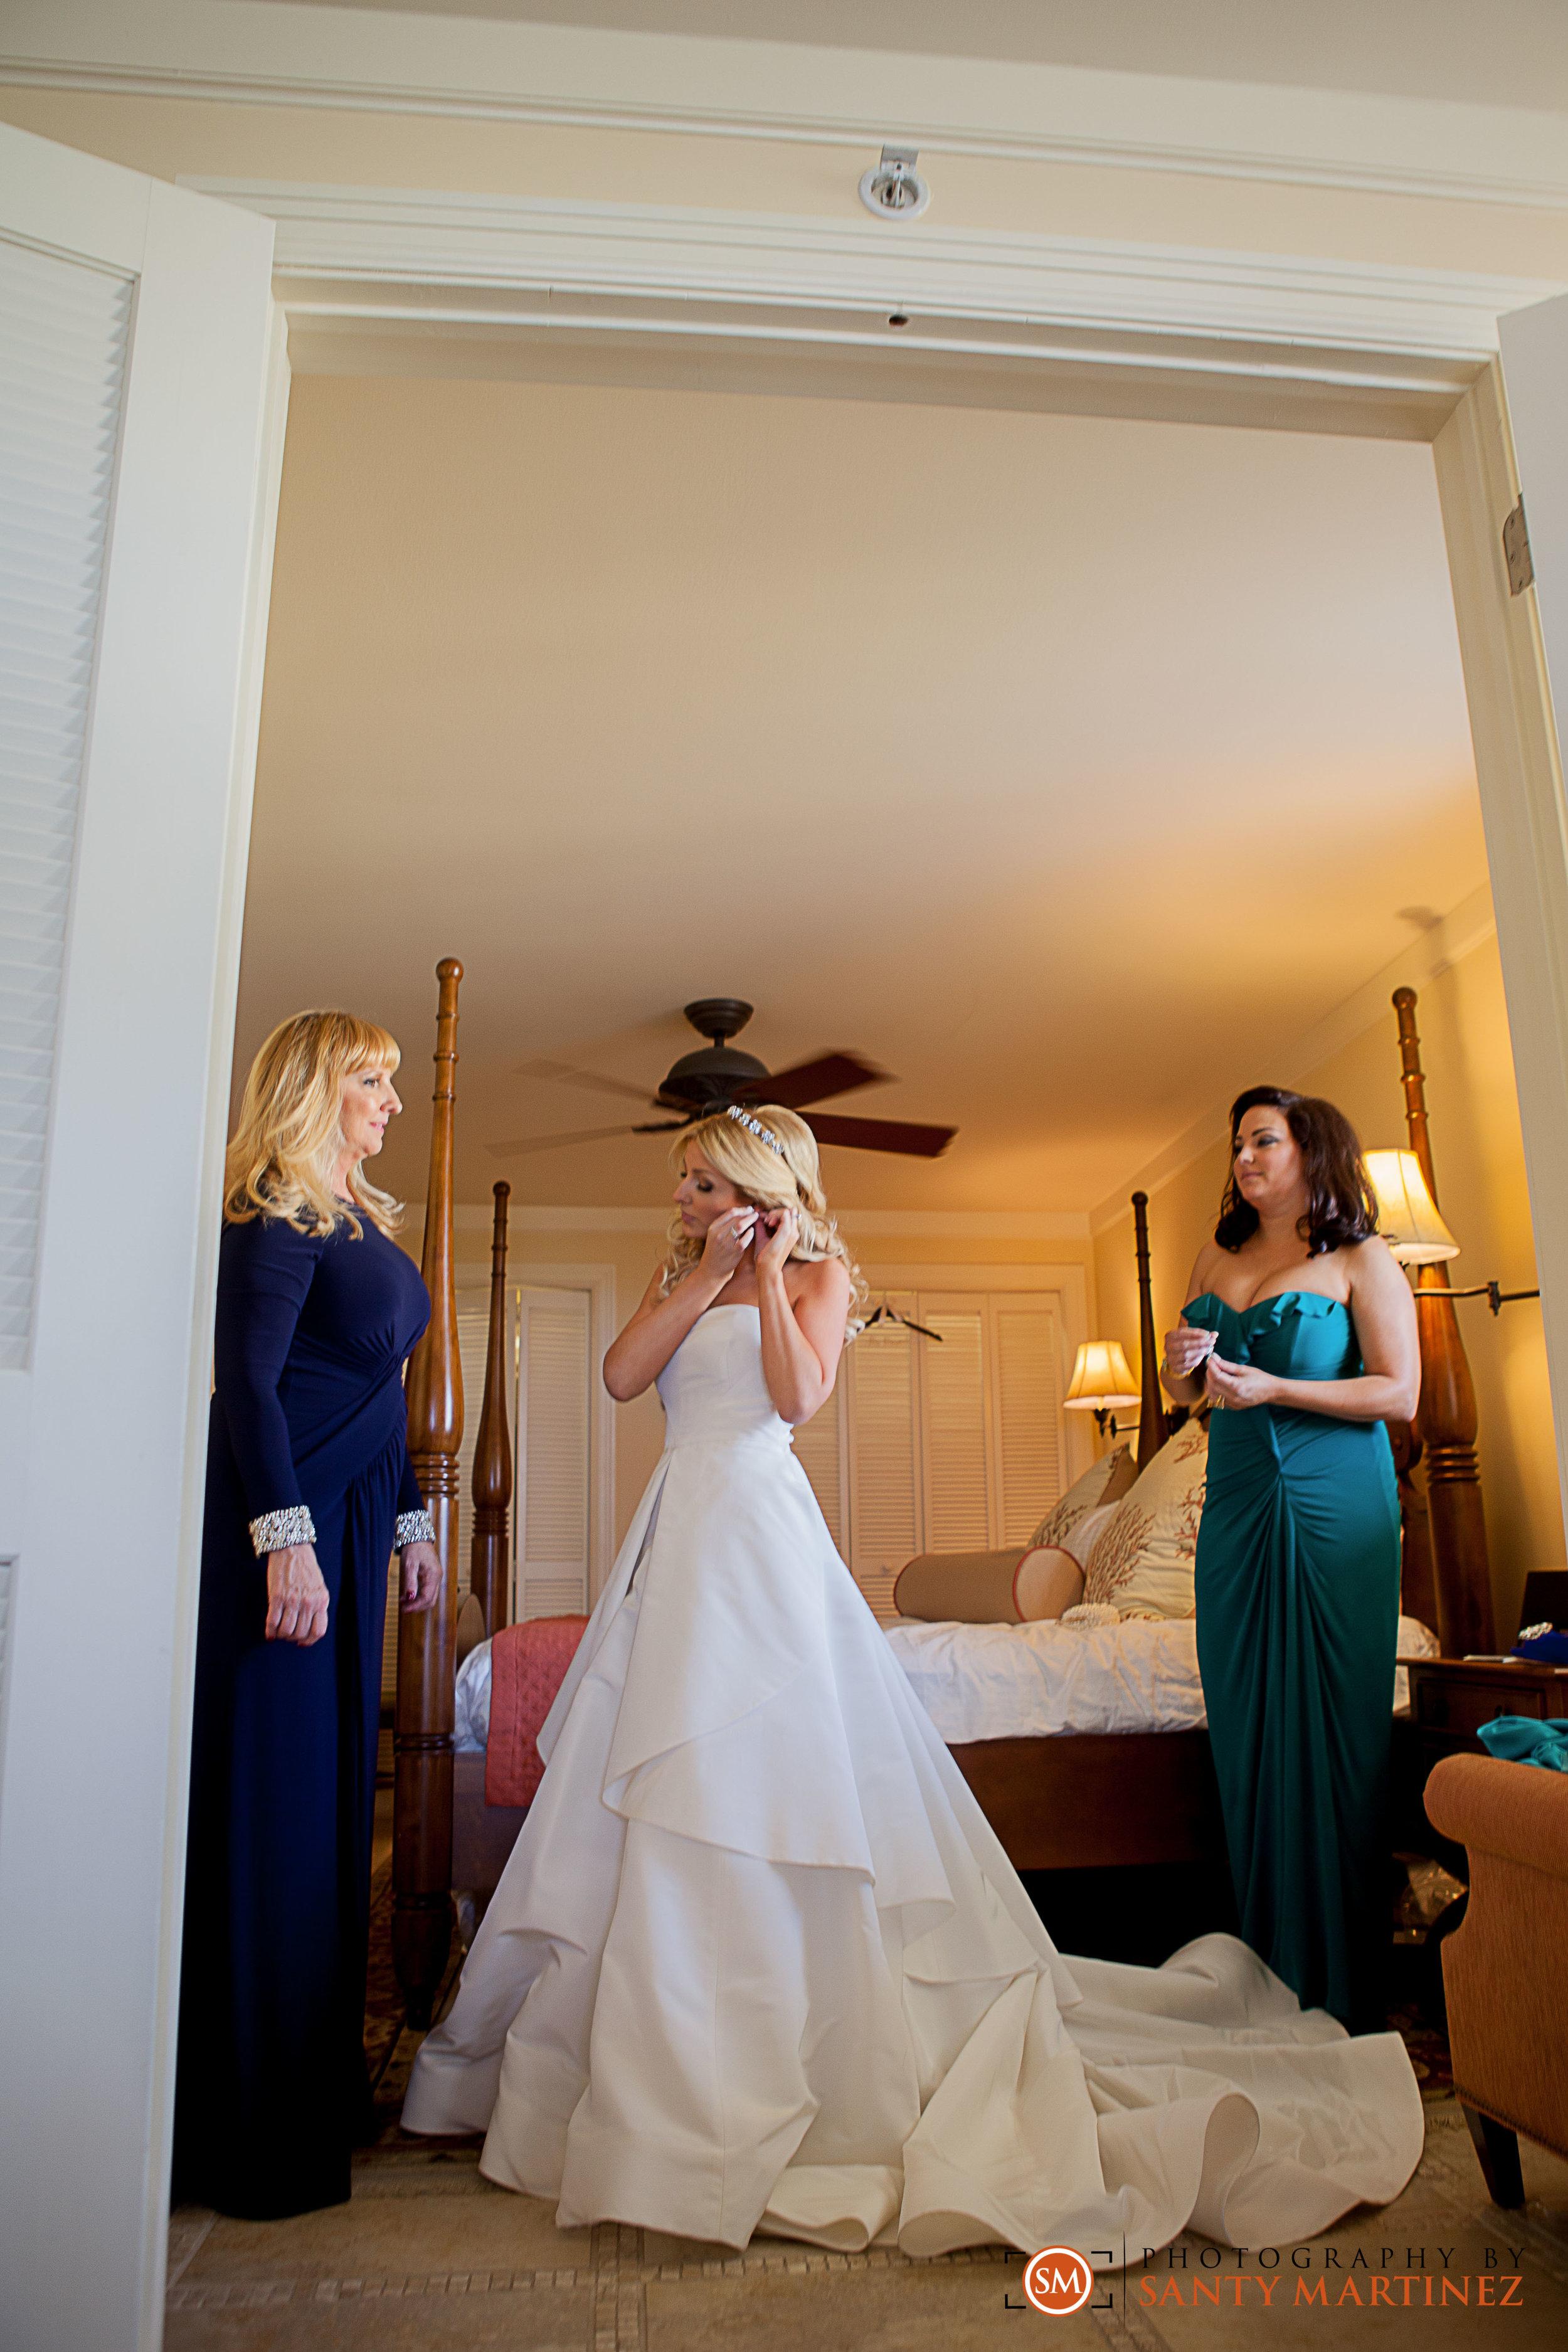 Miami Wedding Photographer - Santy Martinez -3.jpg